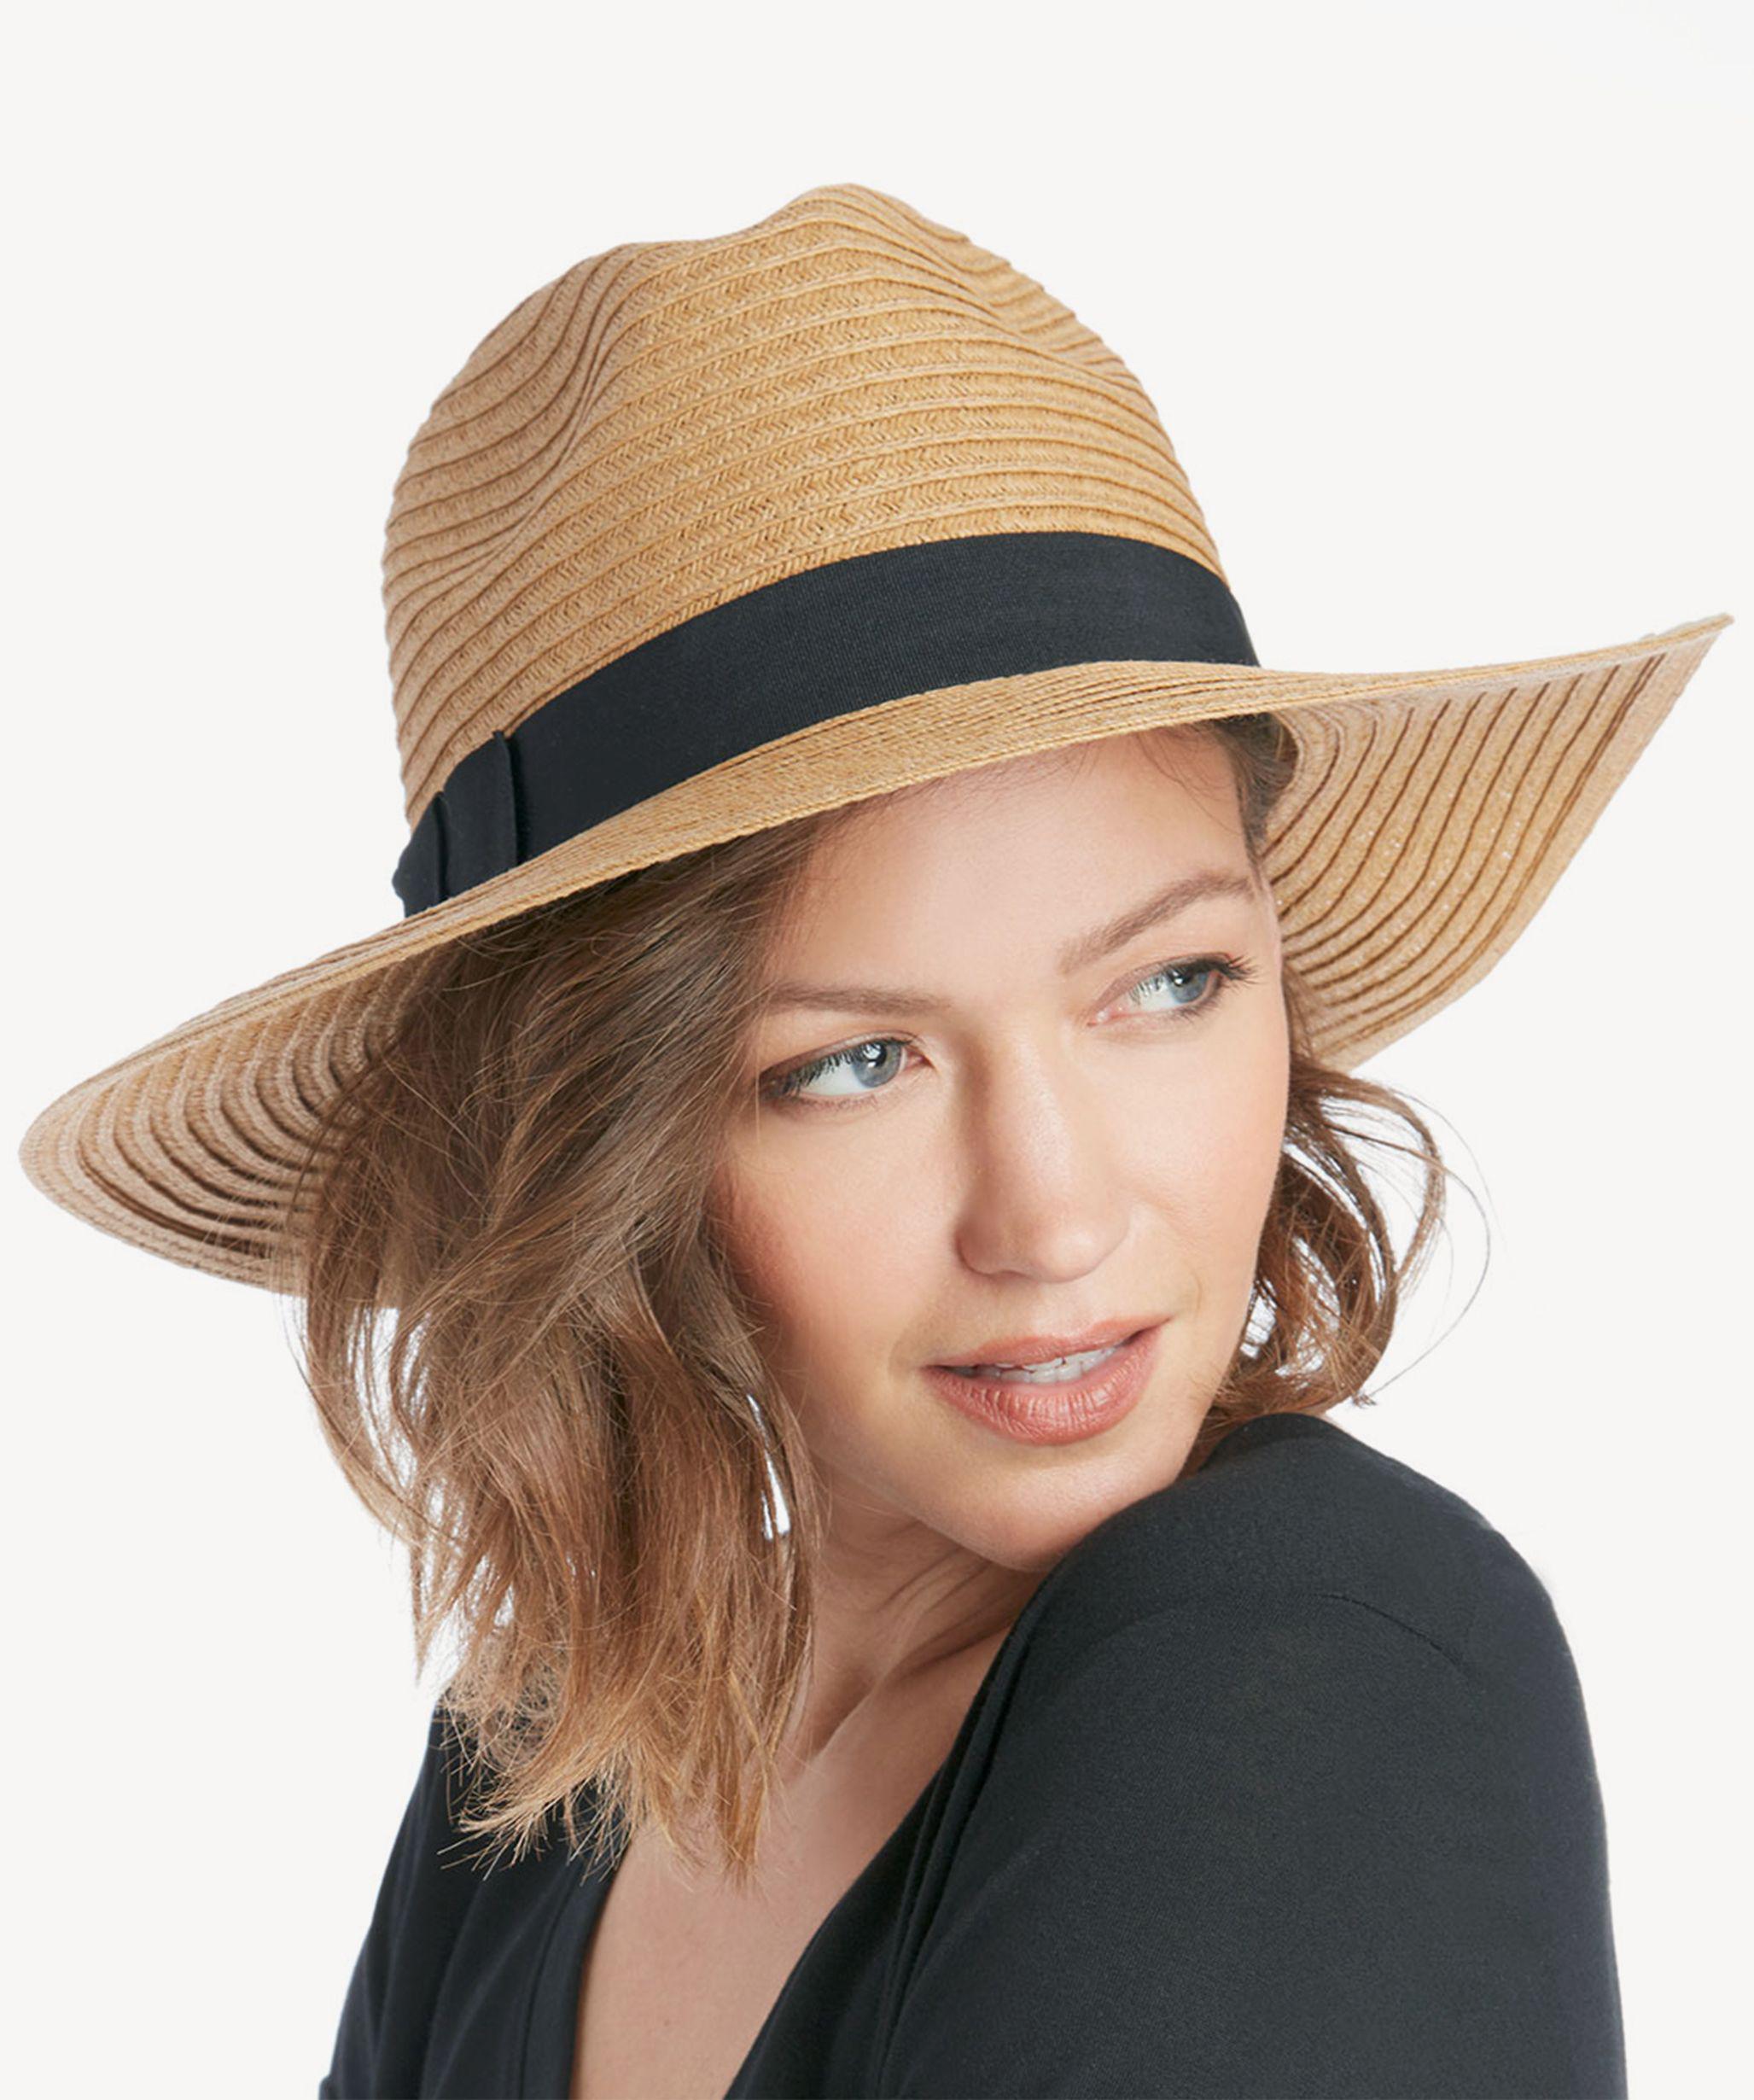 Lyst - Sole Society Wide Brim Panama Hat in Black 6b8437ca889